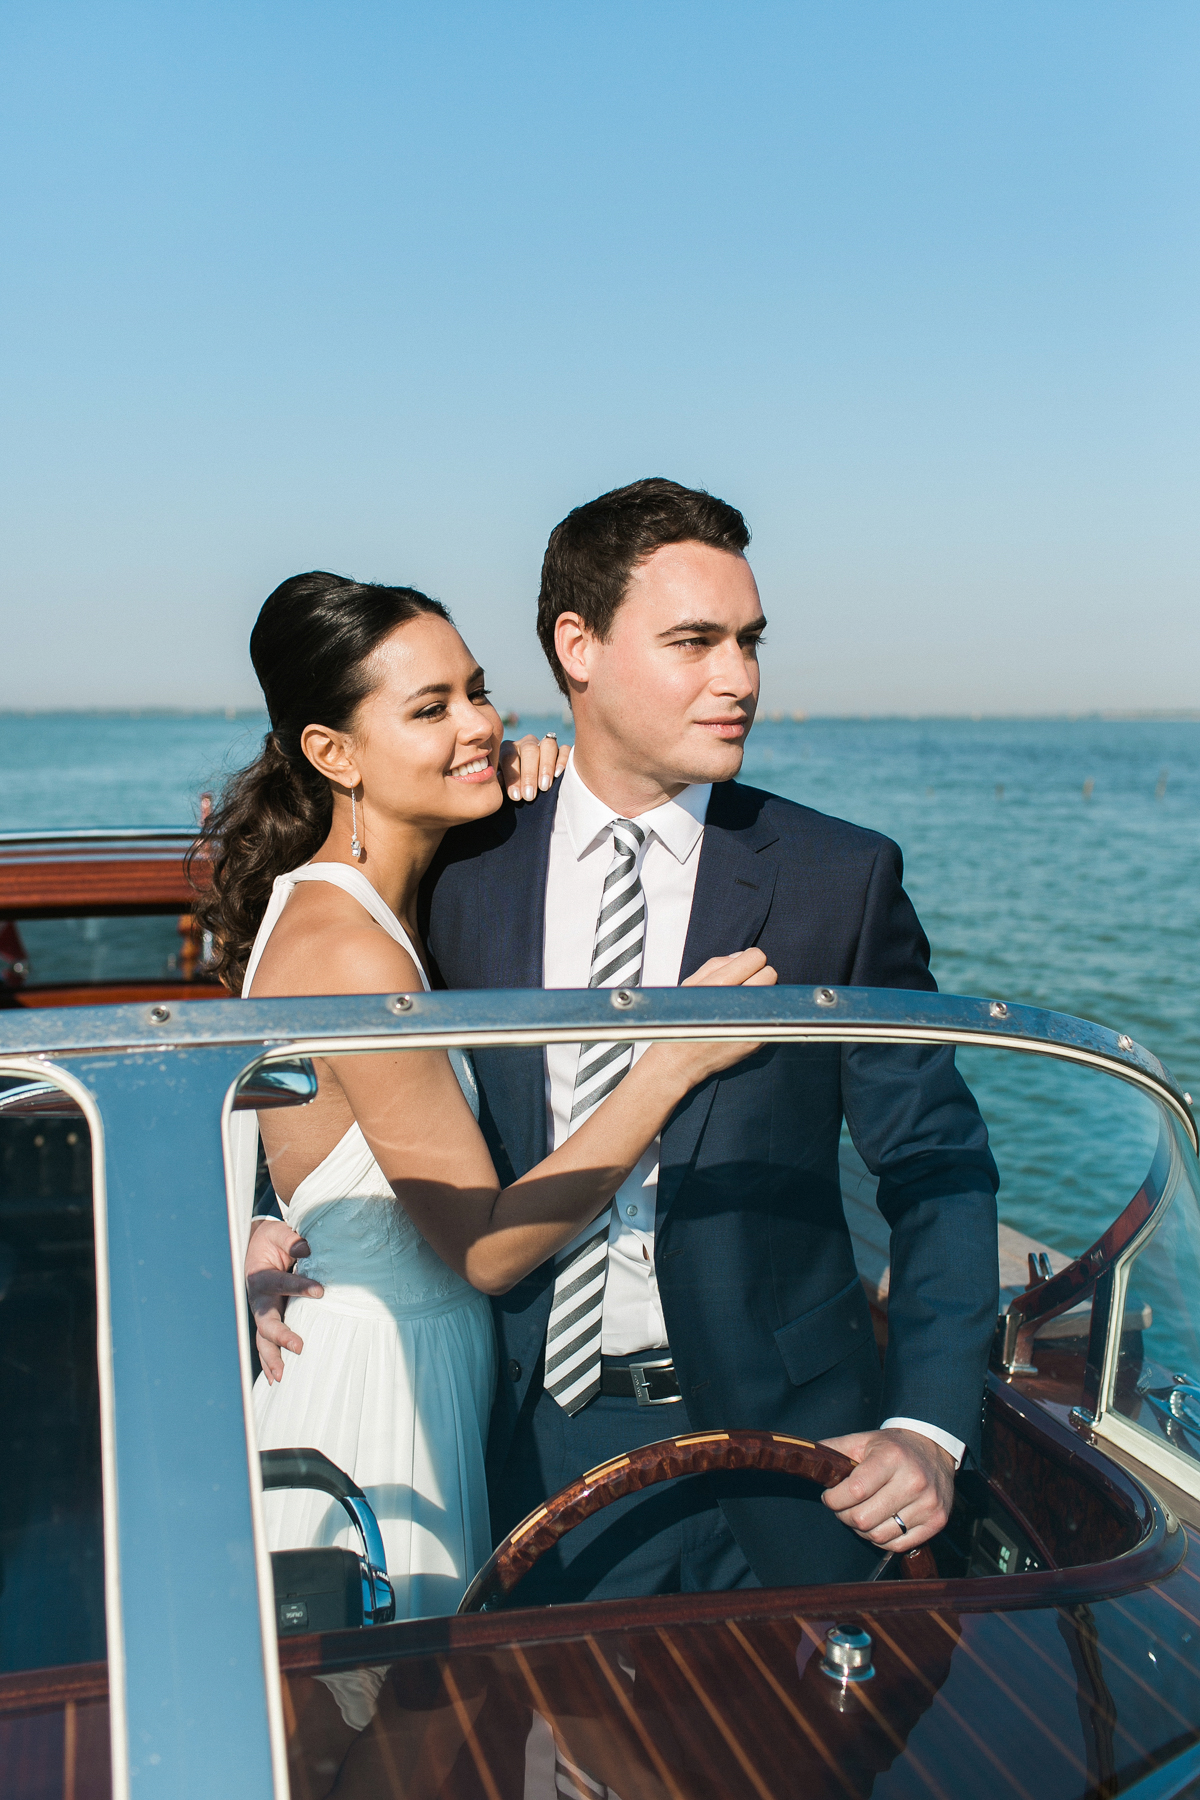 Wedding in Venice Italy